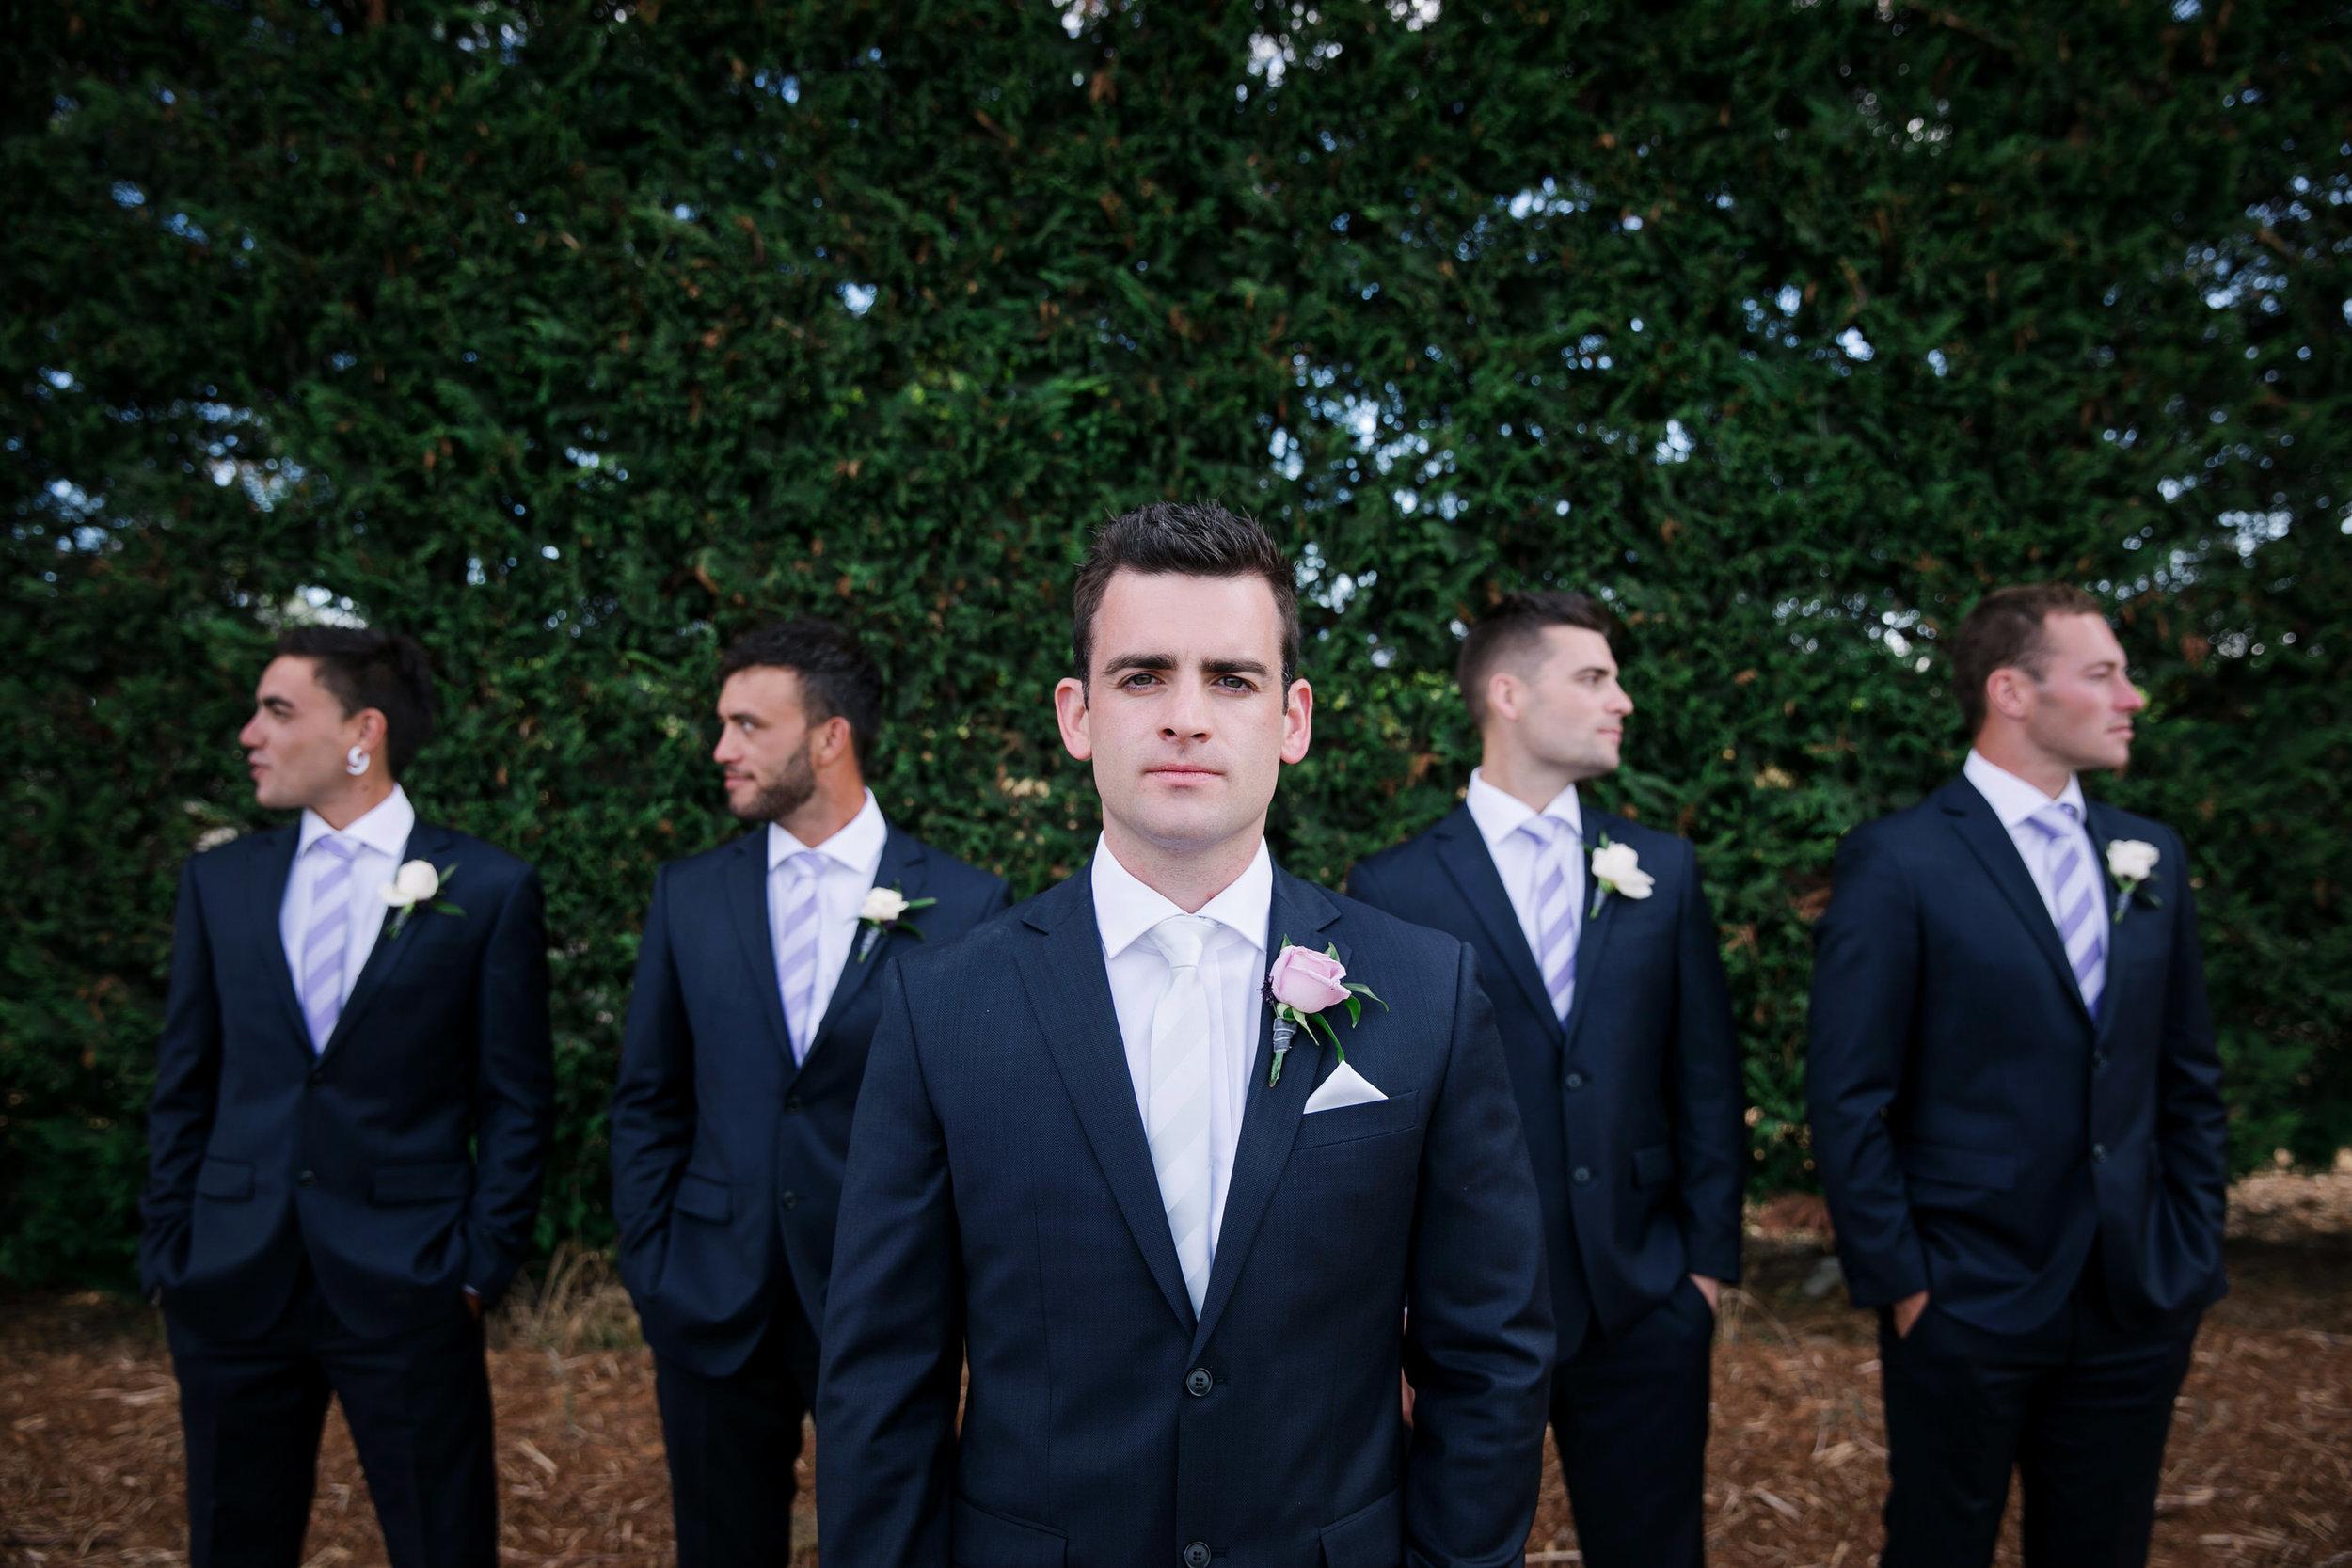 Martinborough-Poppies-Wedding-Caine-Eloise-Toni-Larsen-0097.jpg